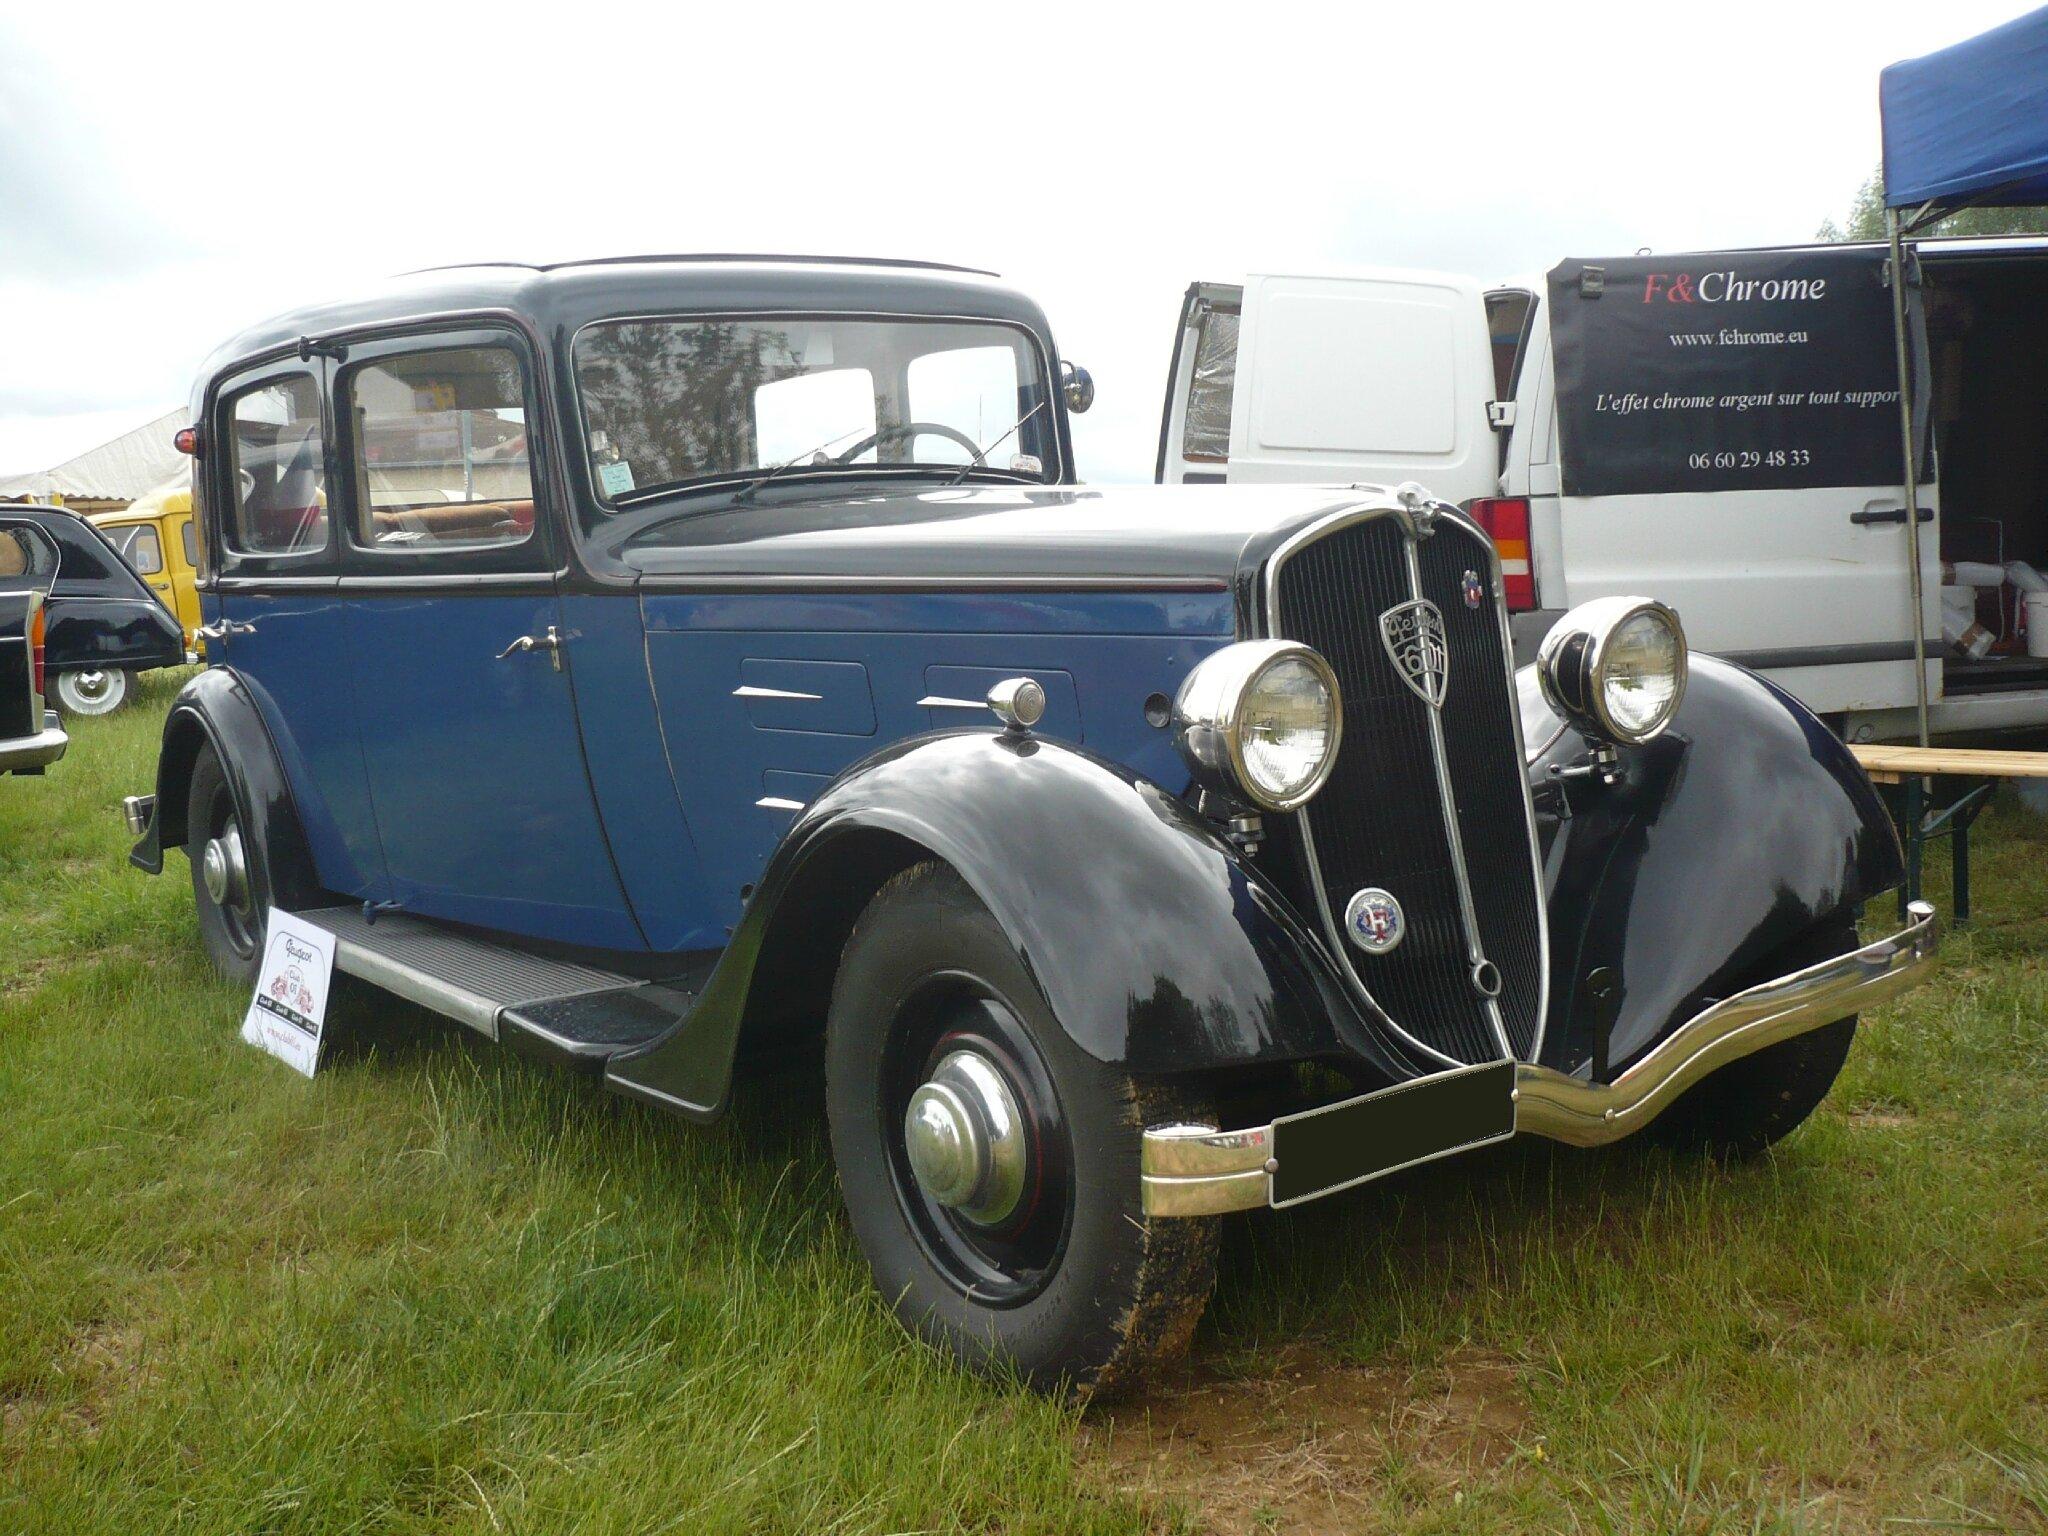 PEUGEOT 601 CR berline 1934 Madine (1)